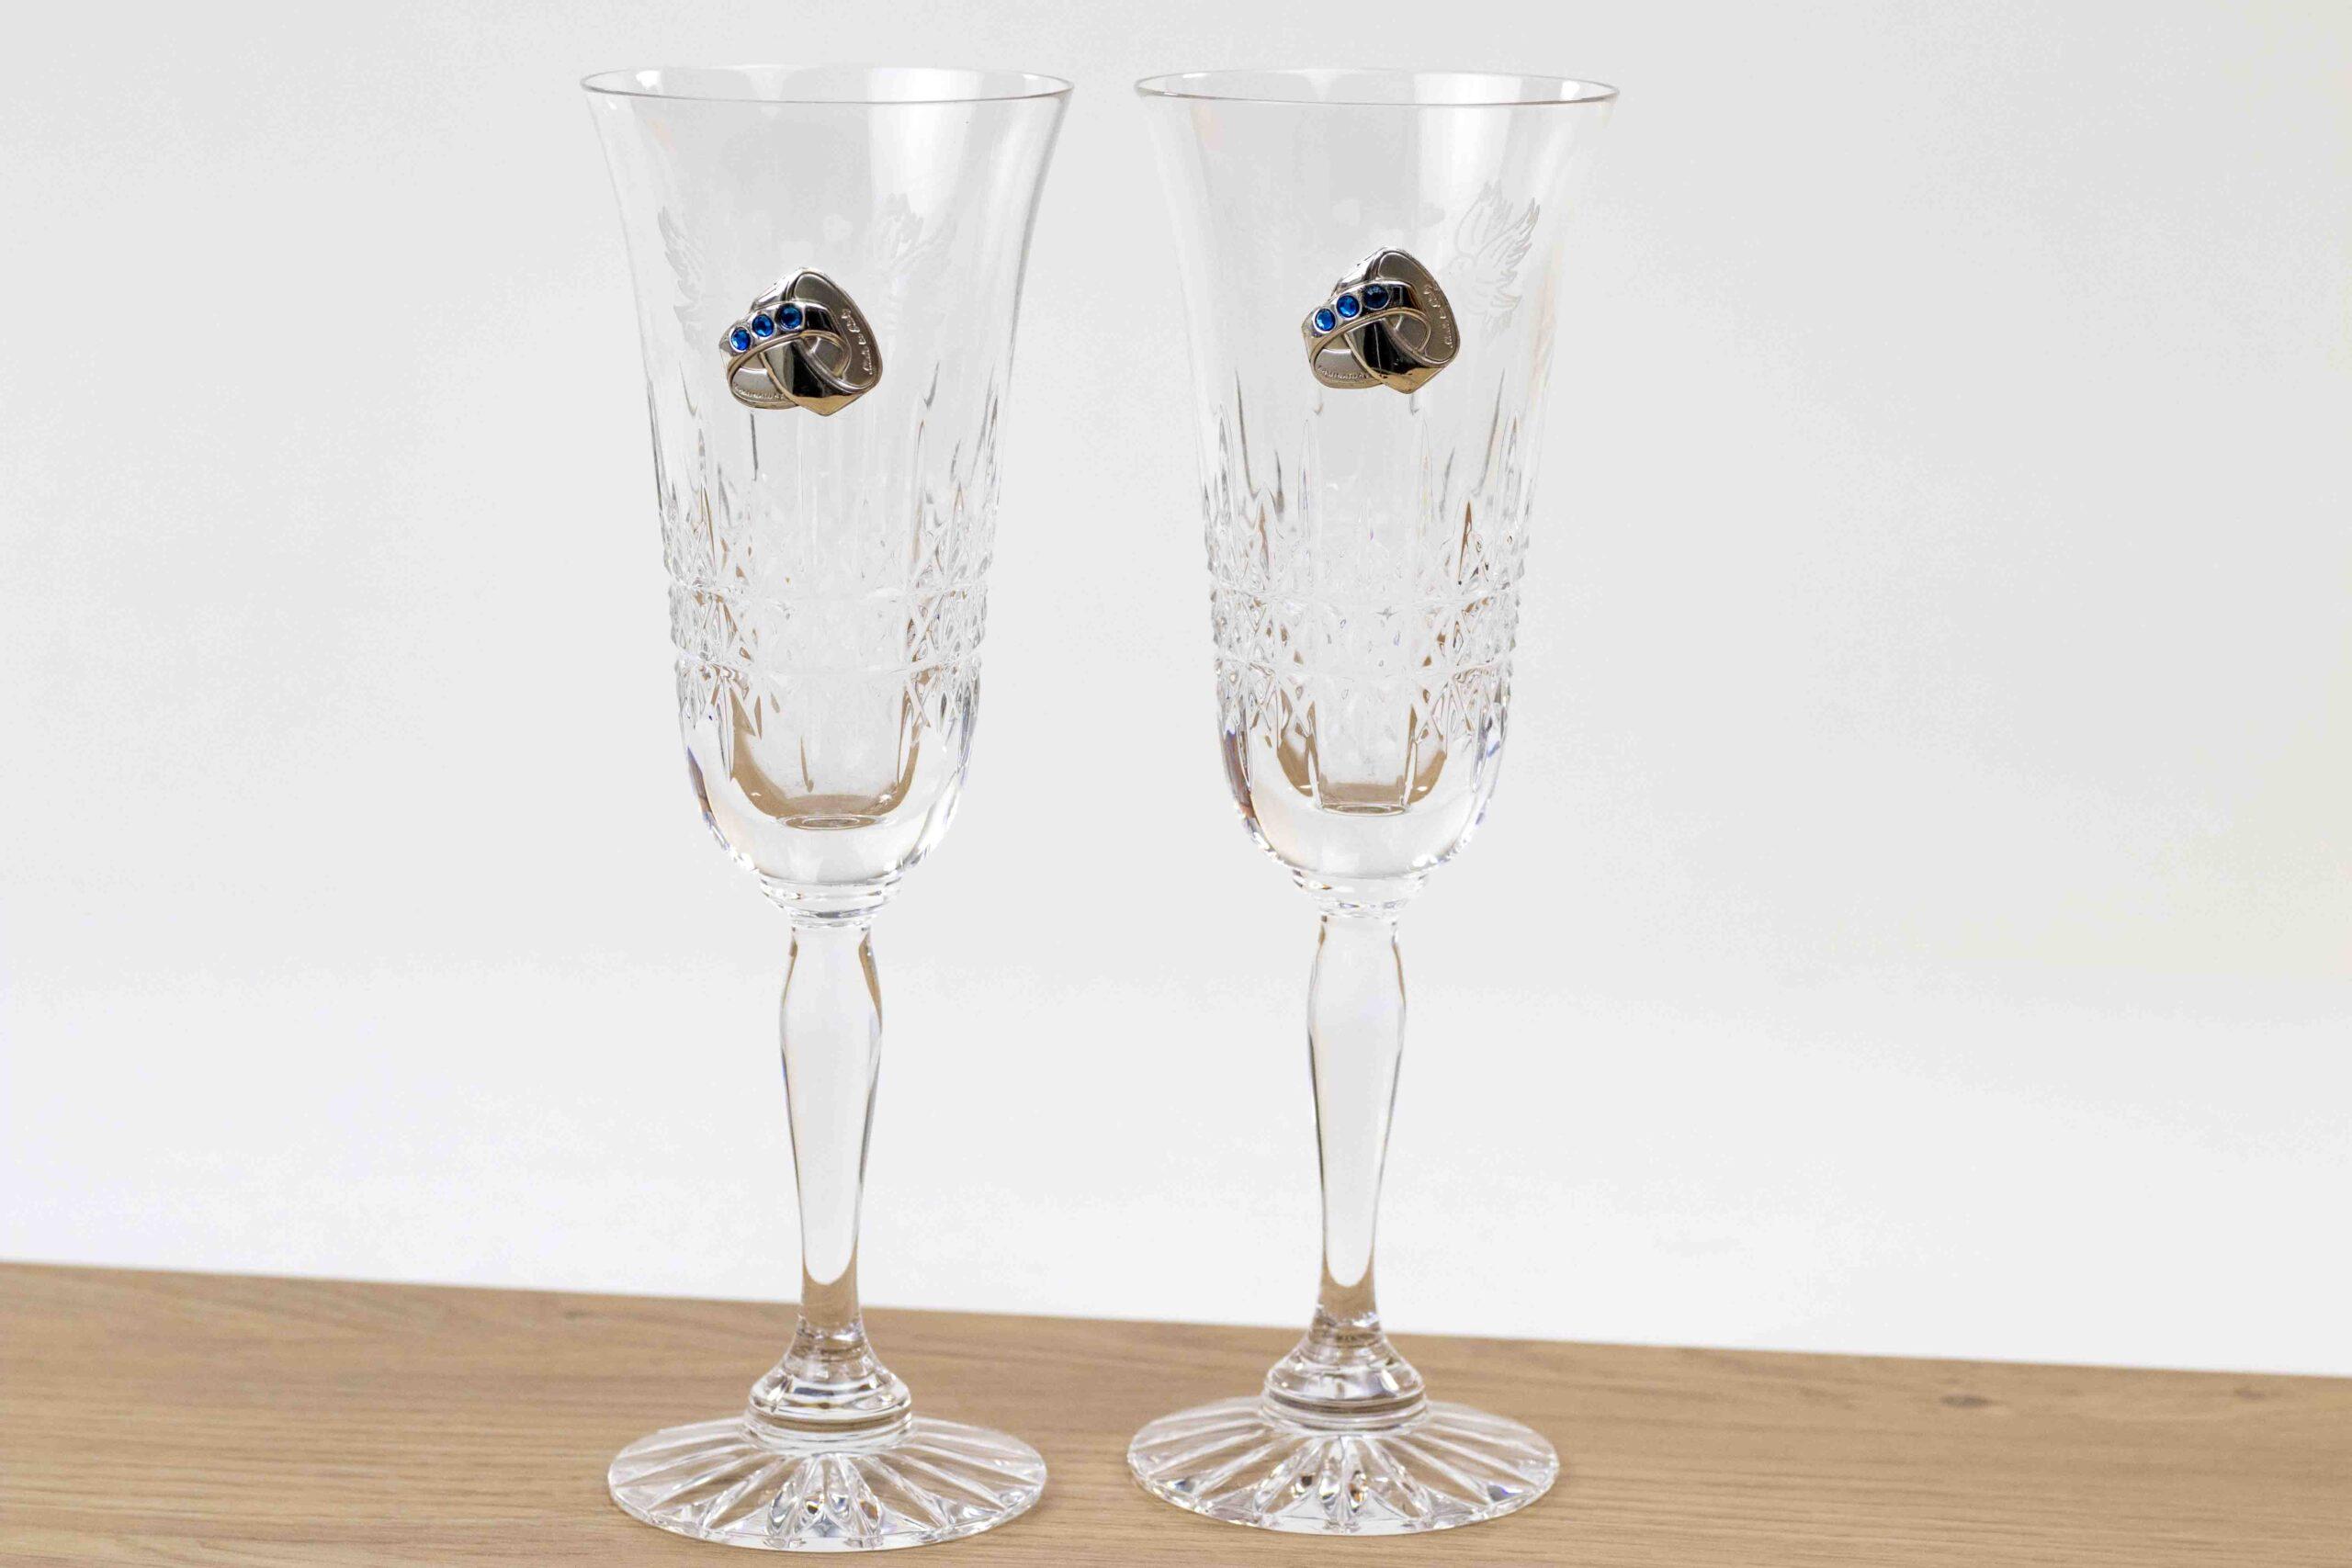 trouwcadeau champagneglazen met zilveren trouwringen,